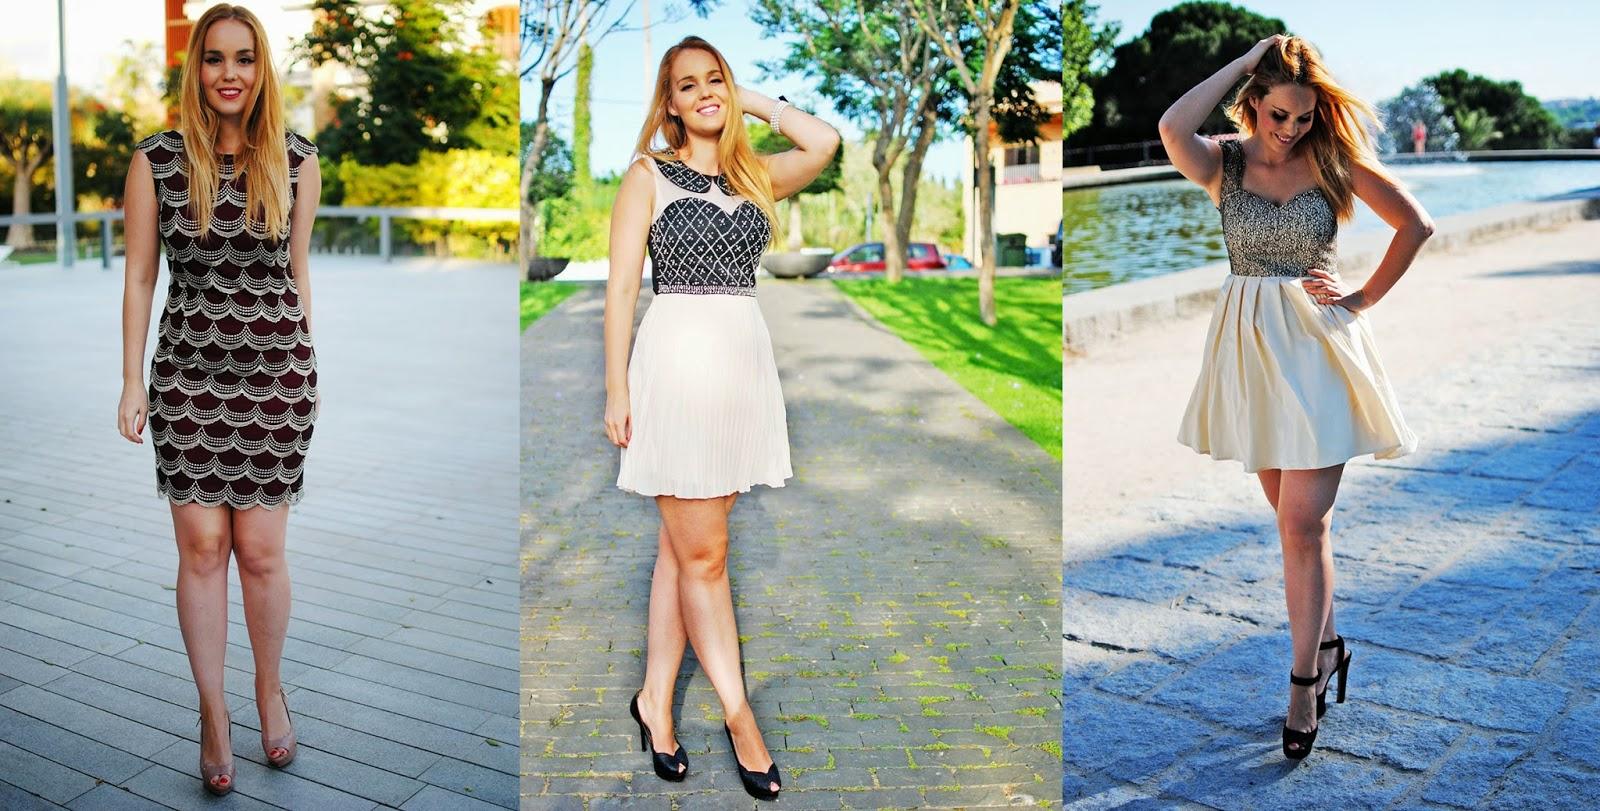 CHI CHI, CHI CHI CLOTHING, Nery hdez, dresses for events, look para graduaciones, BBC